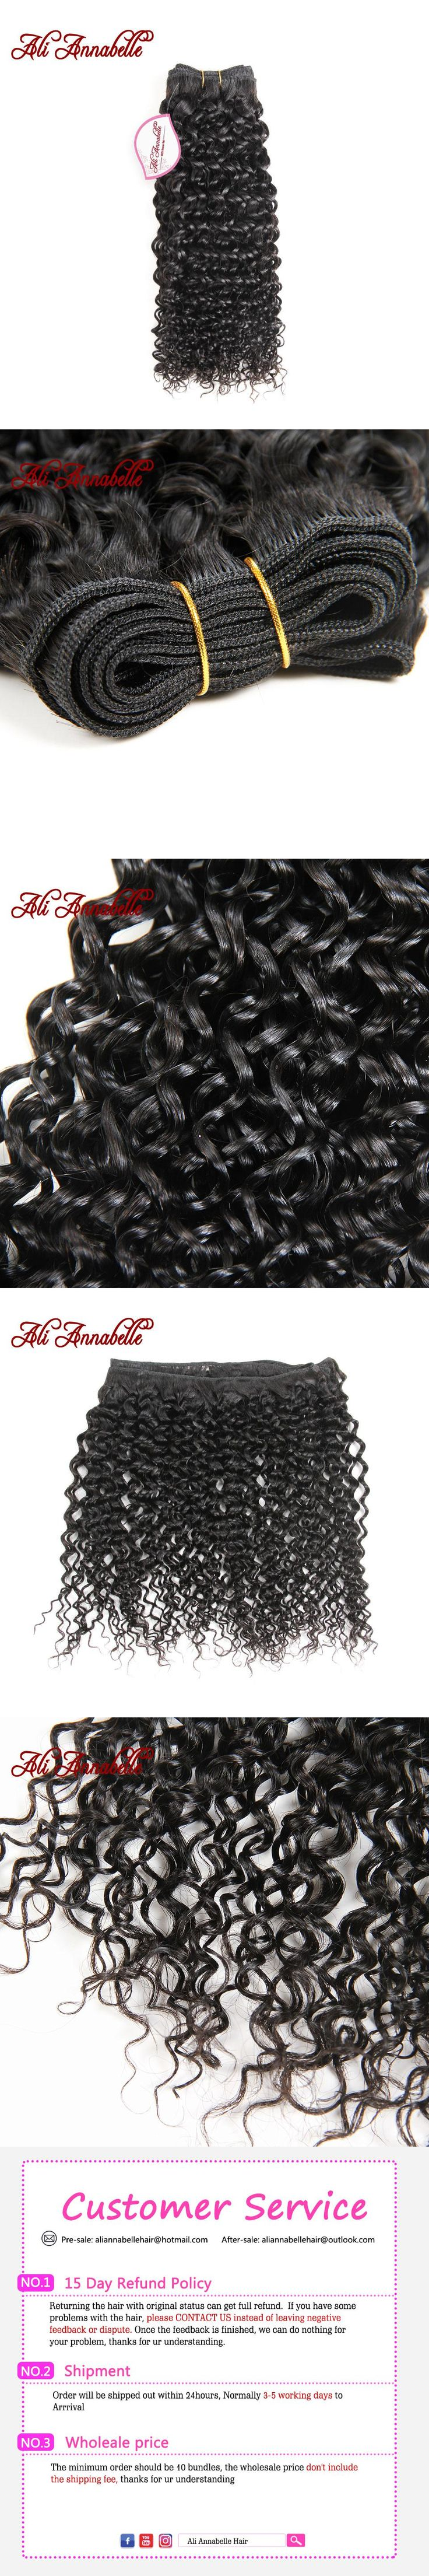 "ALI ANNABELLE HAIR Kinky Curly Malaysian Hair Weave Bundle 100% Human Hair Bundles #1b Can Be Dyed Hair Extensions 10""-28"""